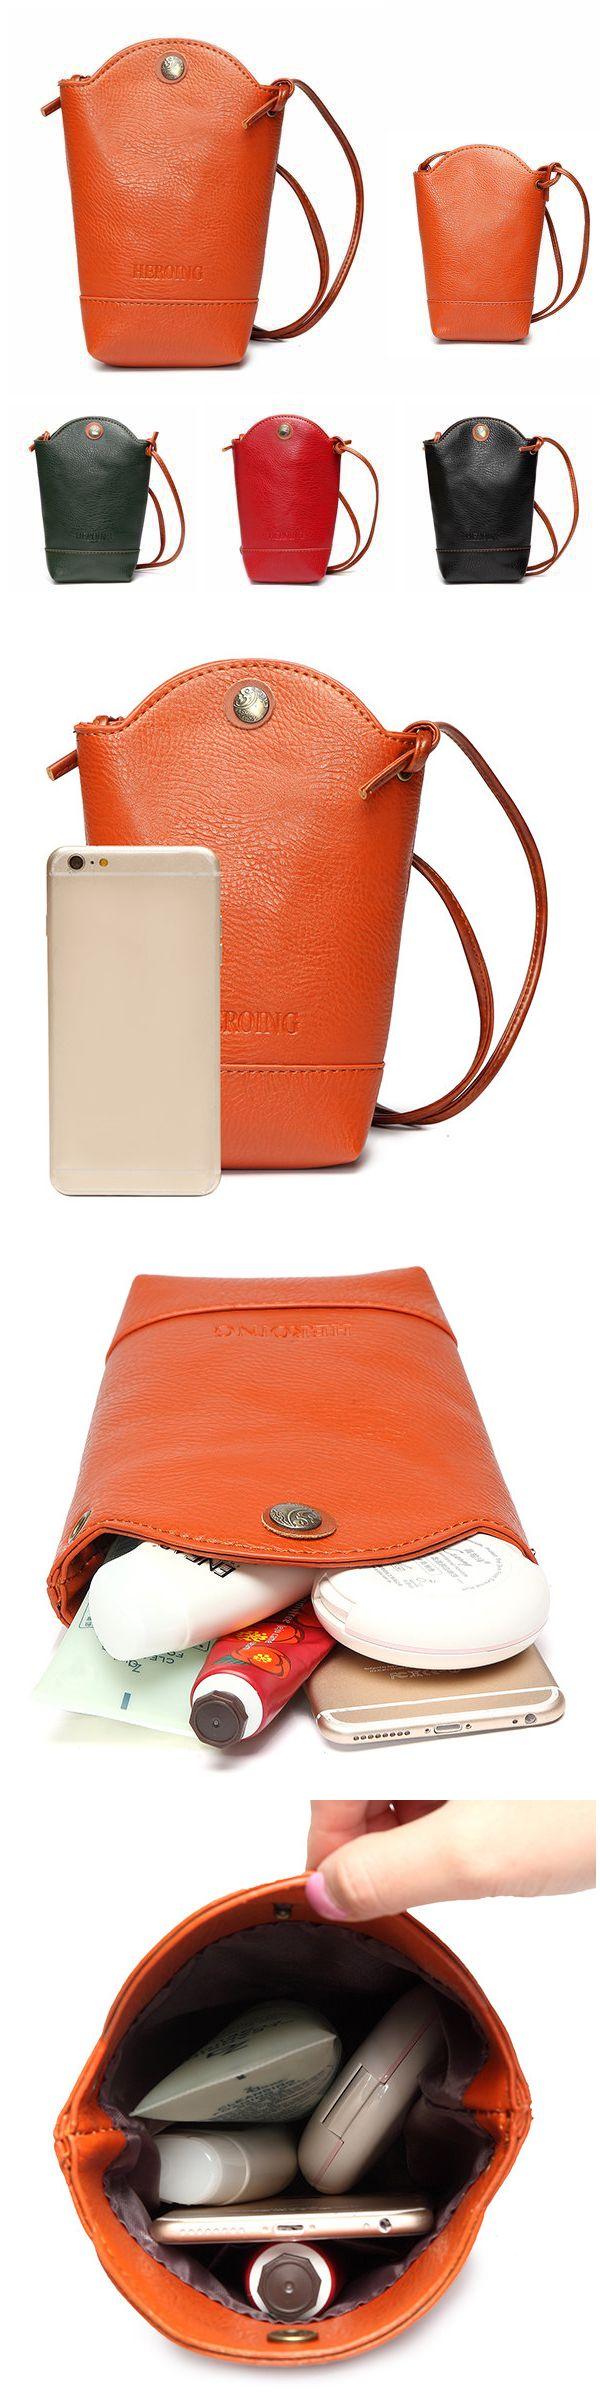 US$8.14 Woman Irregular Little Phone Bag Casual PU Crossbody Bag Bucket Bag